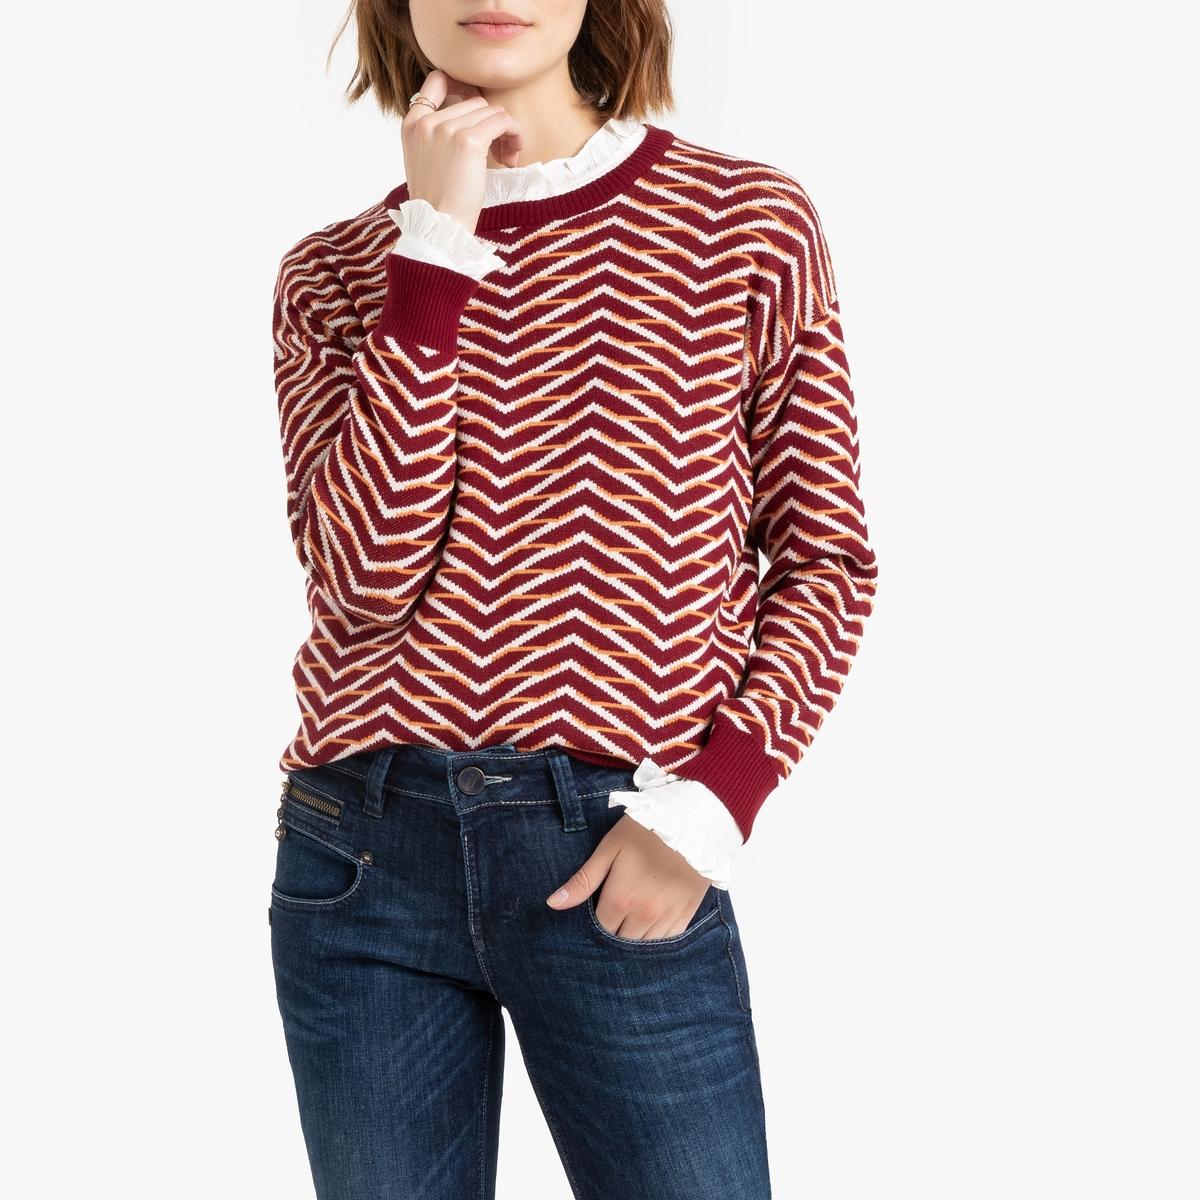 Пуловер La Redoute С графическим рисунком в стиле ретро M красный